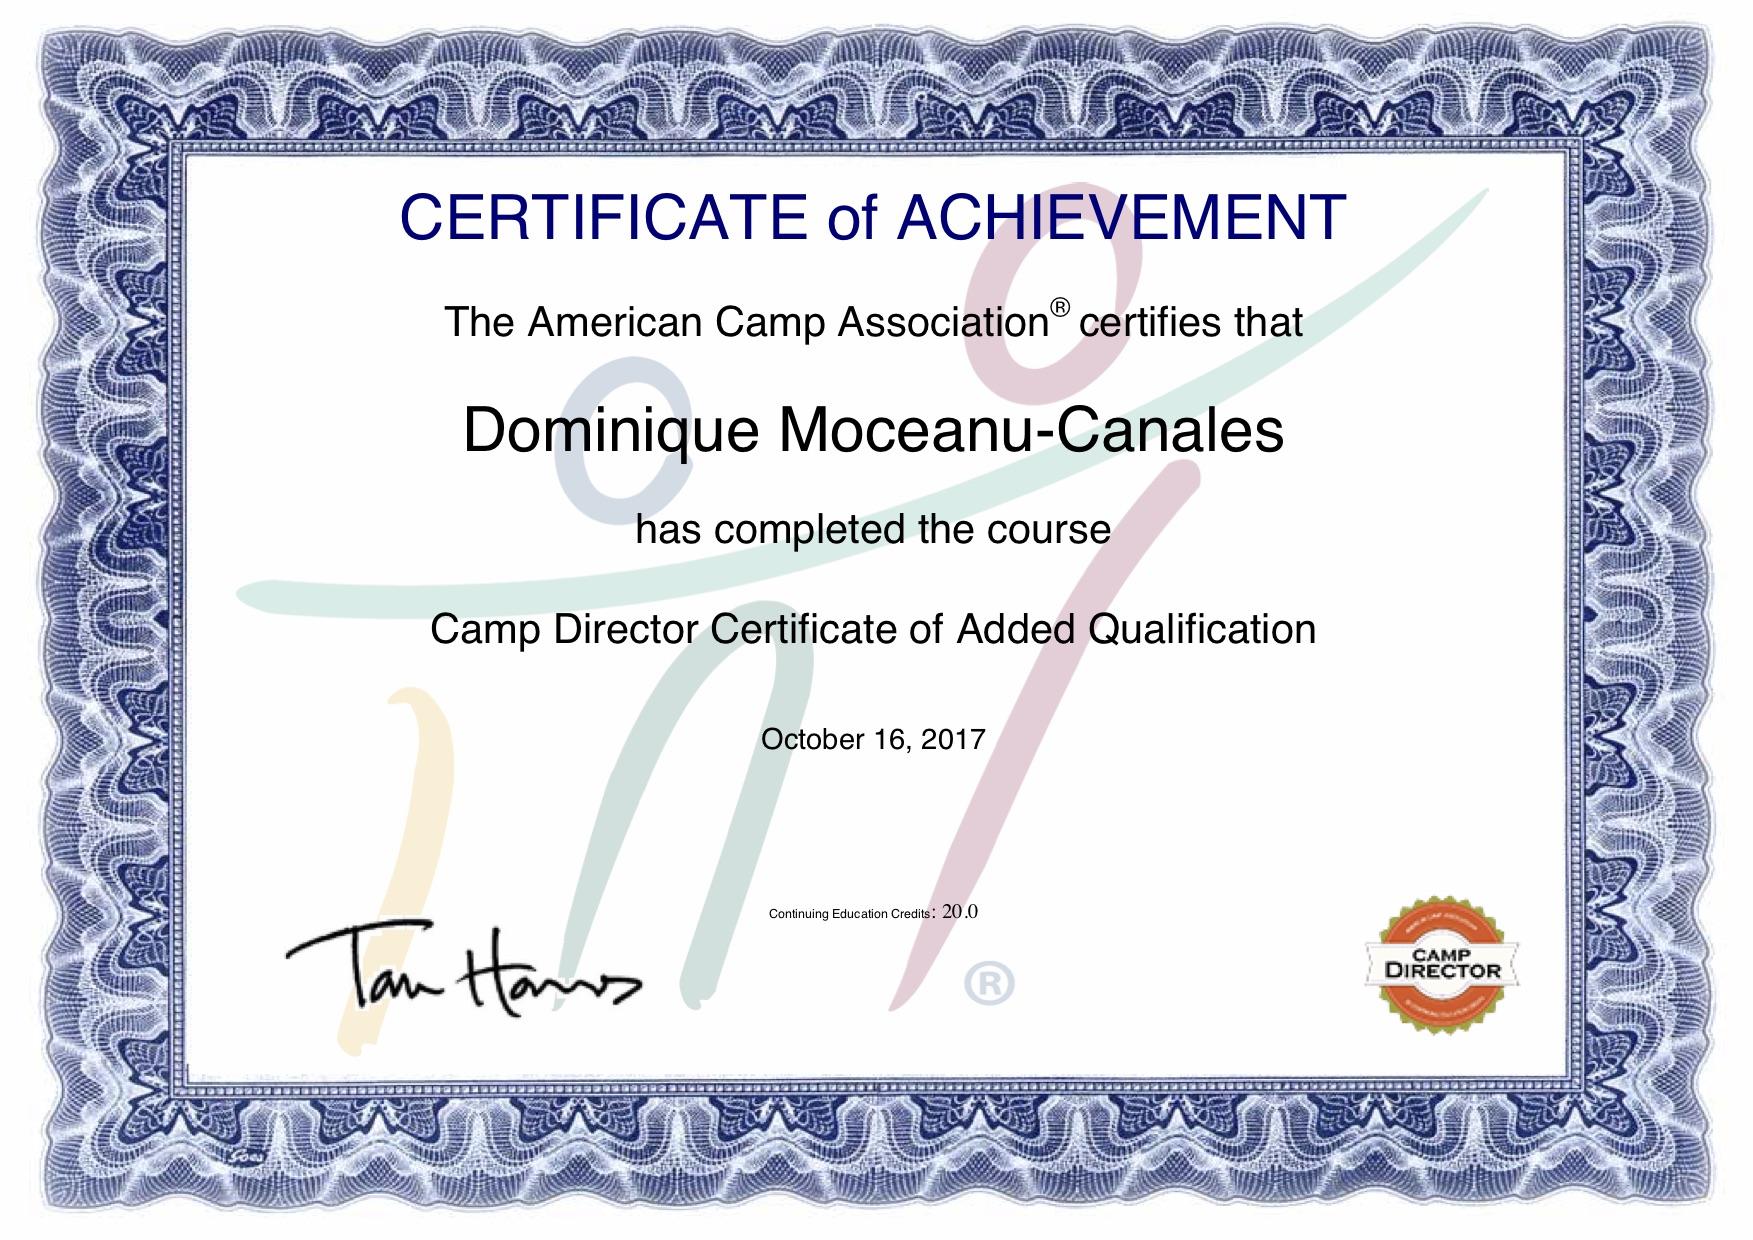 ACA Camp Director Certificate.jpg